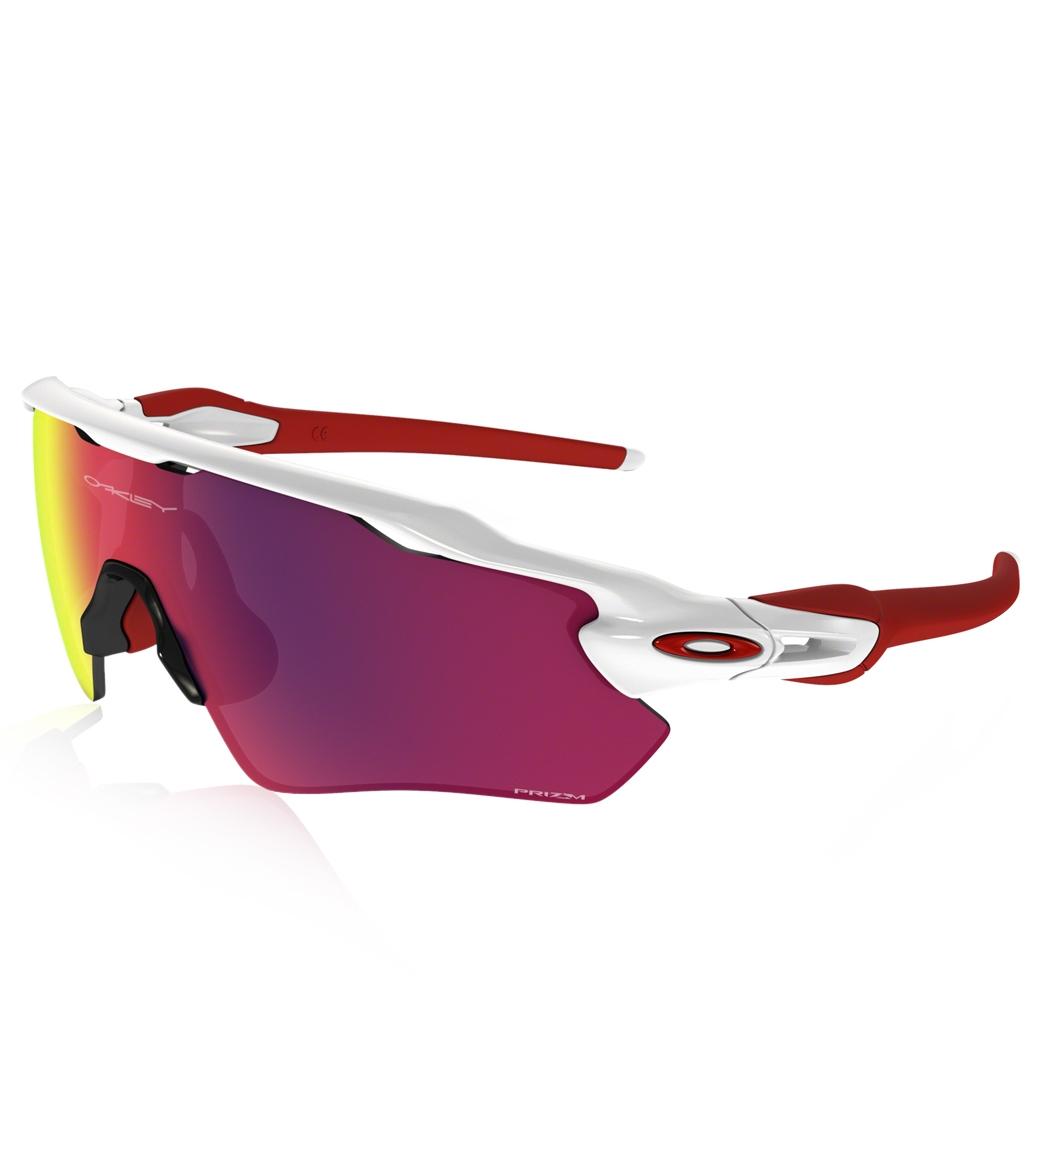 Oakley Men's Radar EV Path Prizm Sunglasses at SwimOutlet.com - Free  Shipping. '